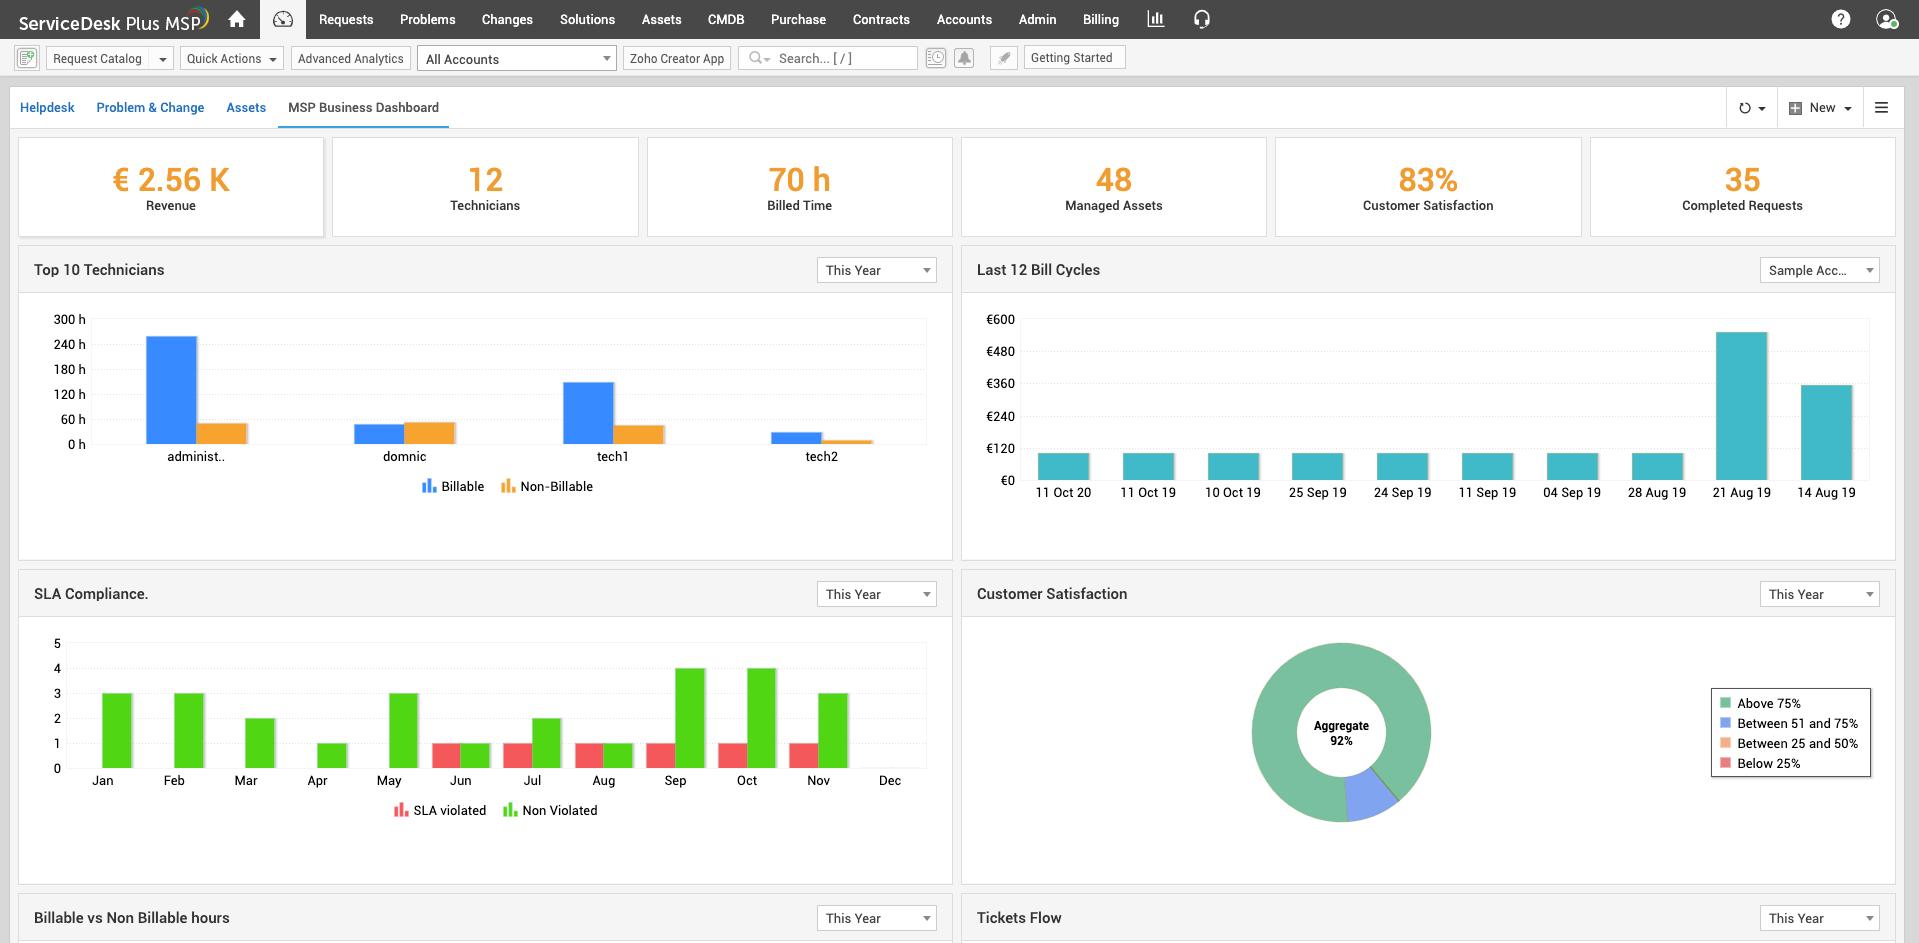 MSP metrics and KPIs